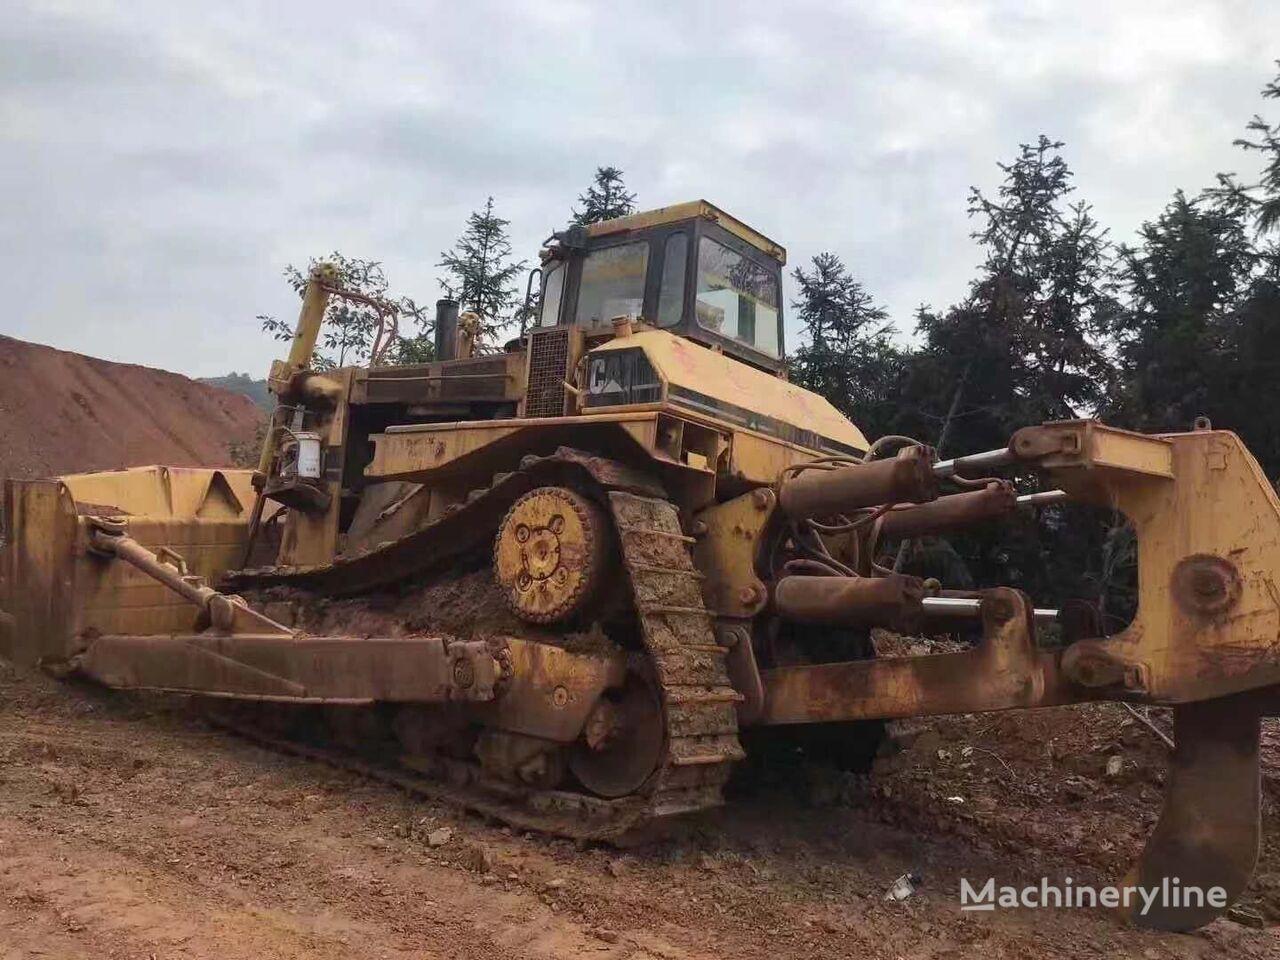 CATERPILLAR D9L  bulldozer